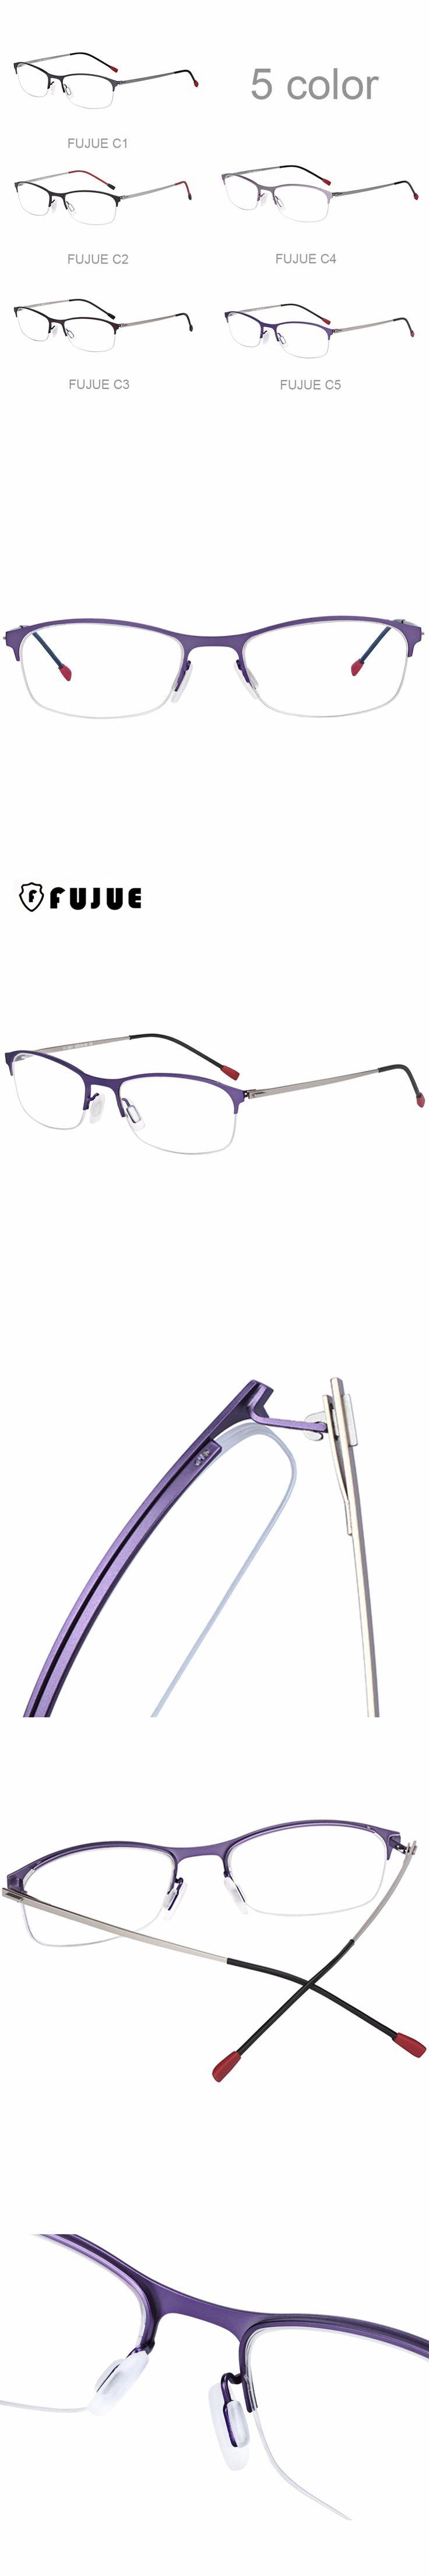 FUJUE Semi-rimless Optical Eyewear Frames Metal Computer Reading Glasses Frame Fashion Women Men Half frame Eyeglasses FJ3031